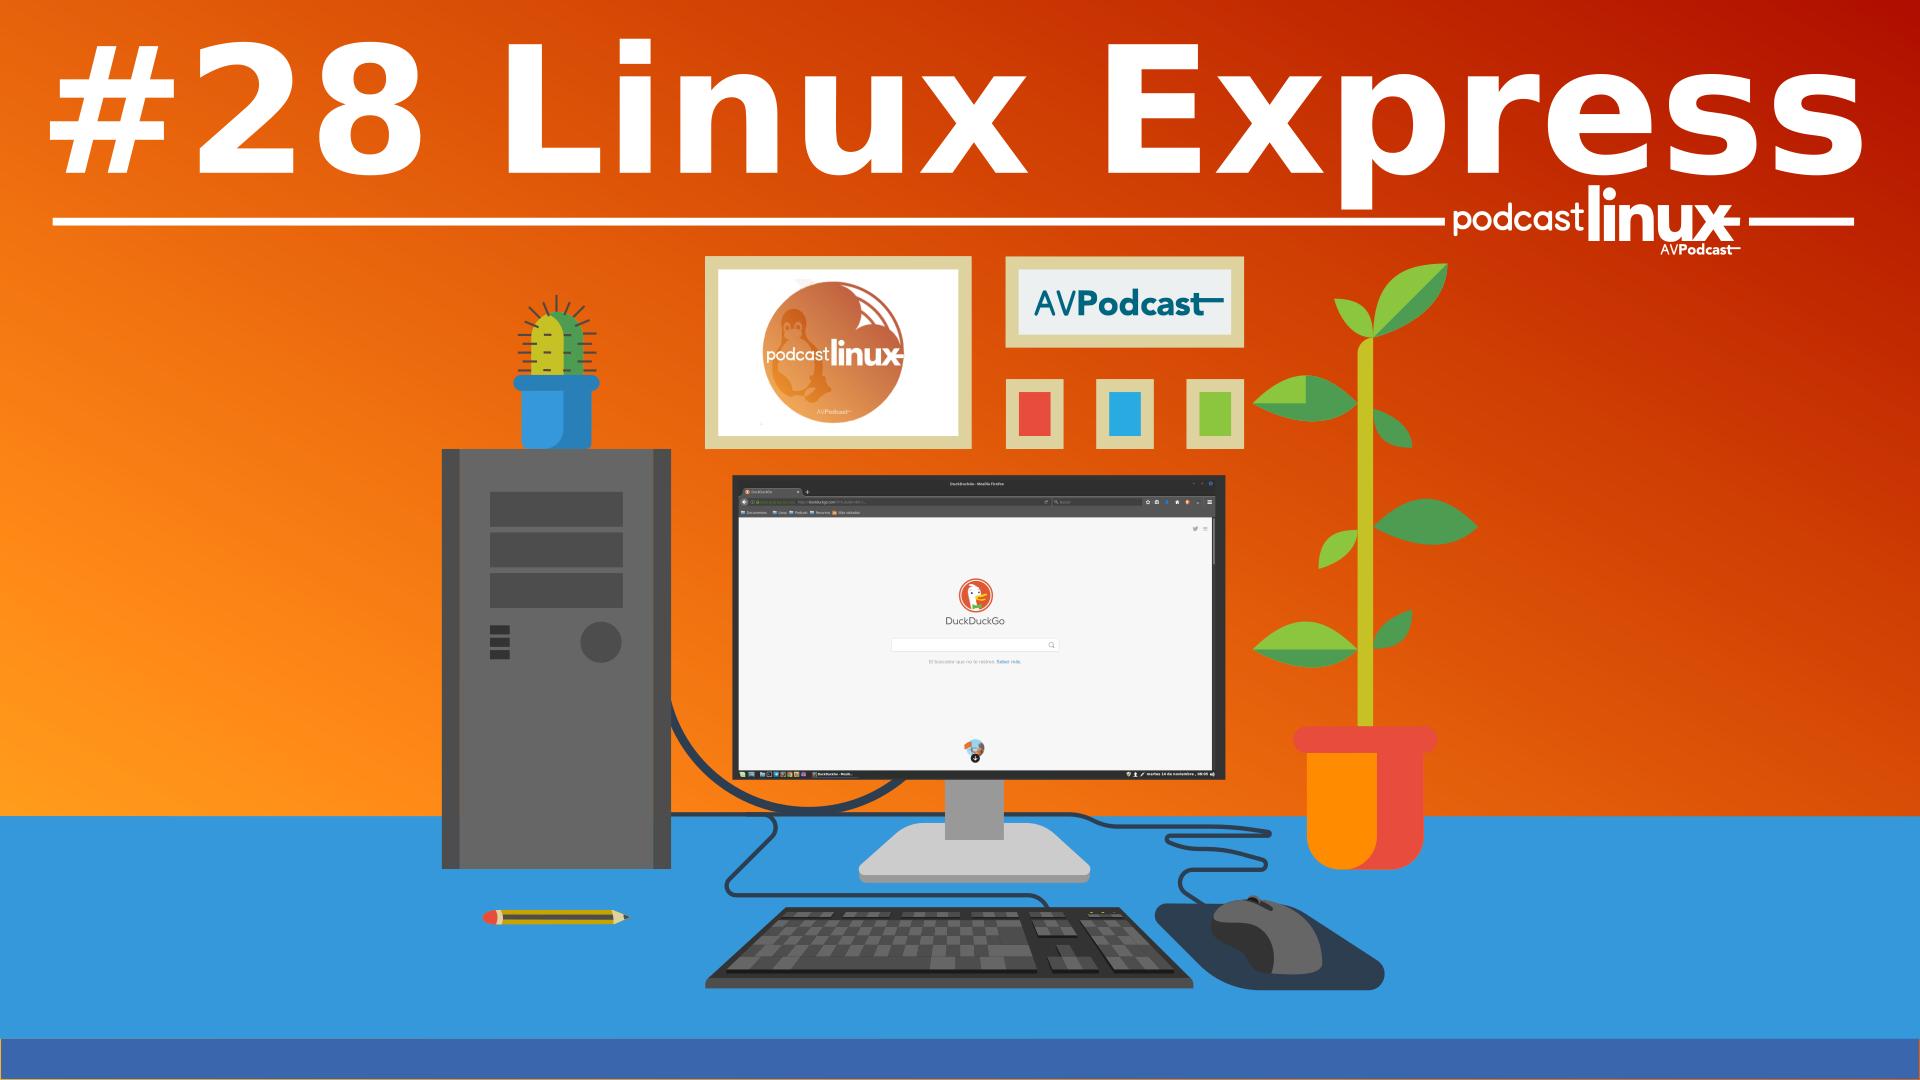 #28 Linux Express